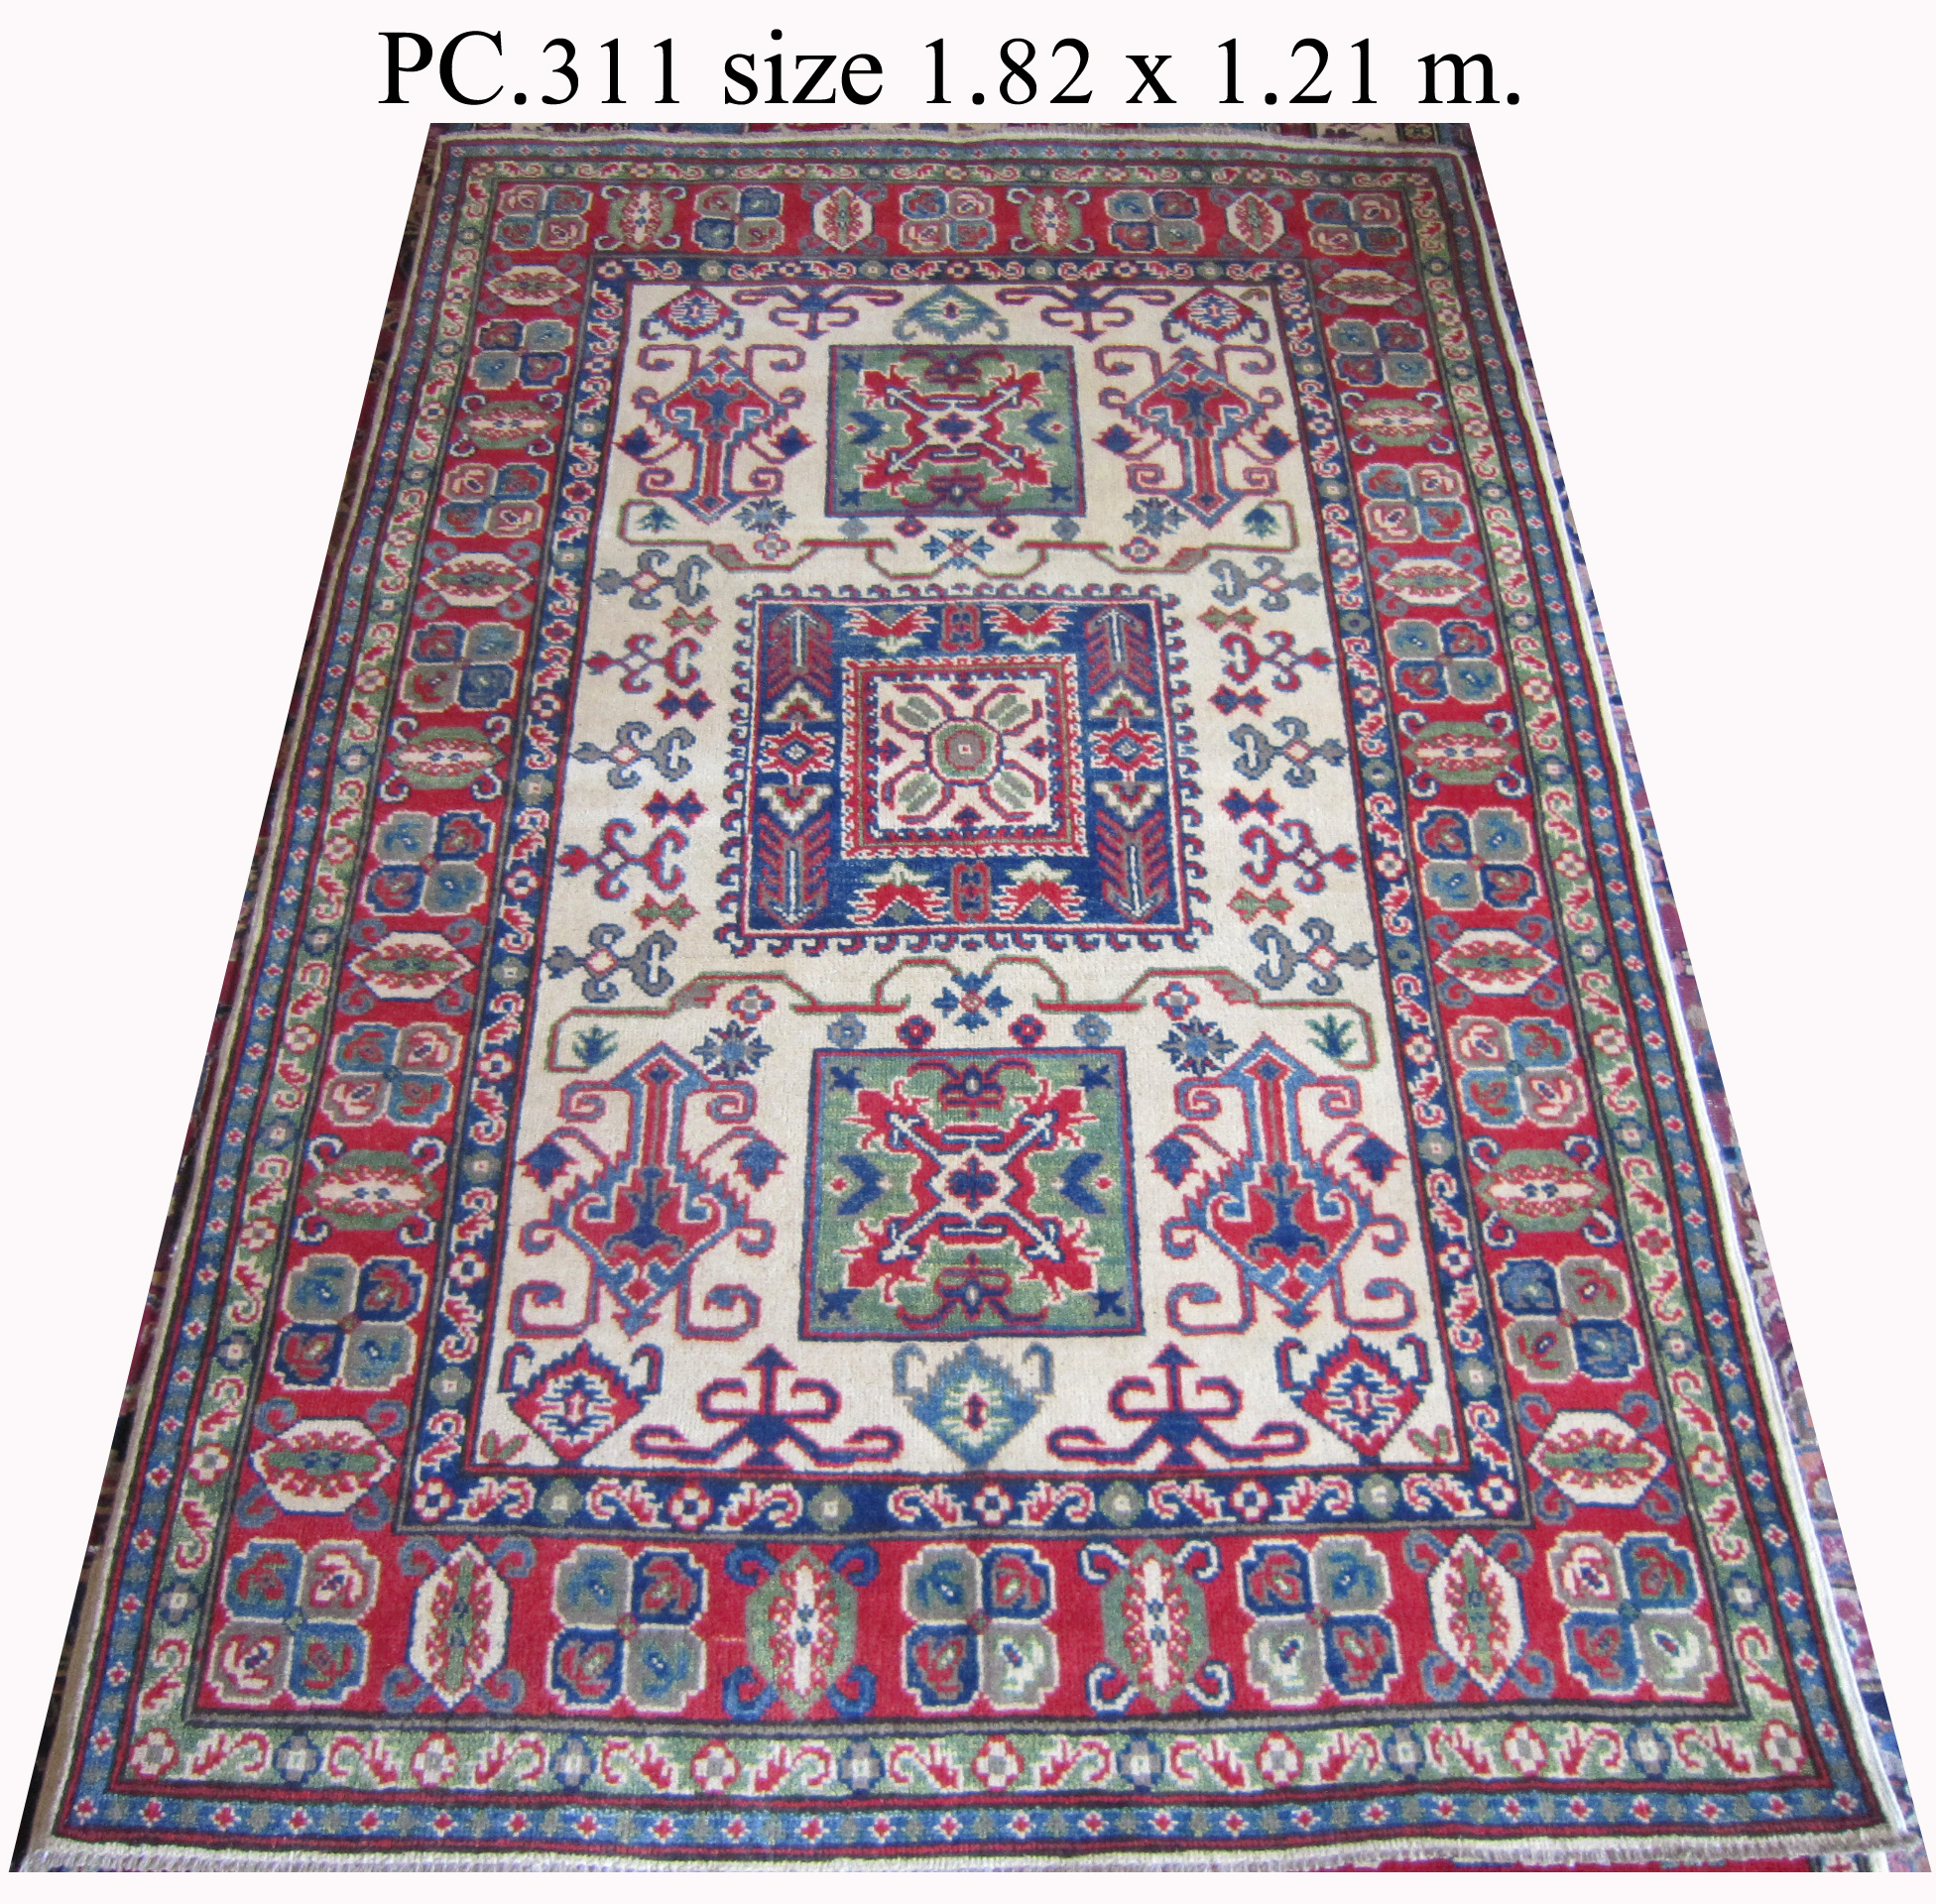 Gallery persian carpets bangkok thailand for Ecksofa 1 80 m